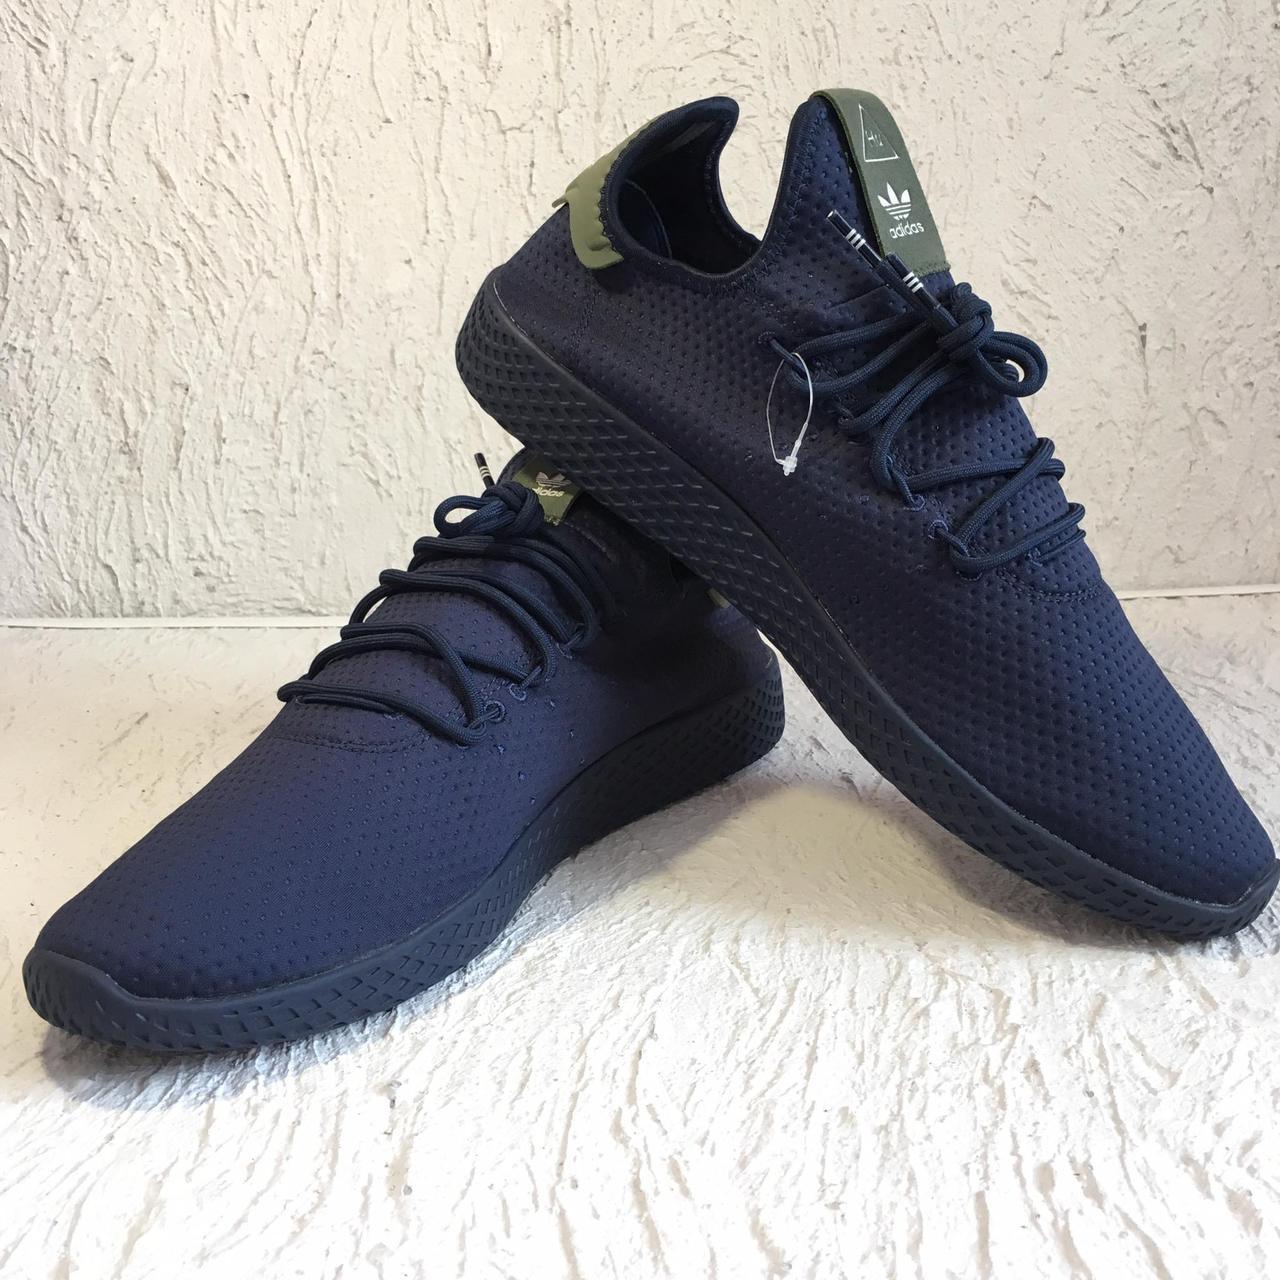 Кроссовки Adidas Pharrell Williams Tennis Hu B41807 47 1/3 размер